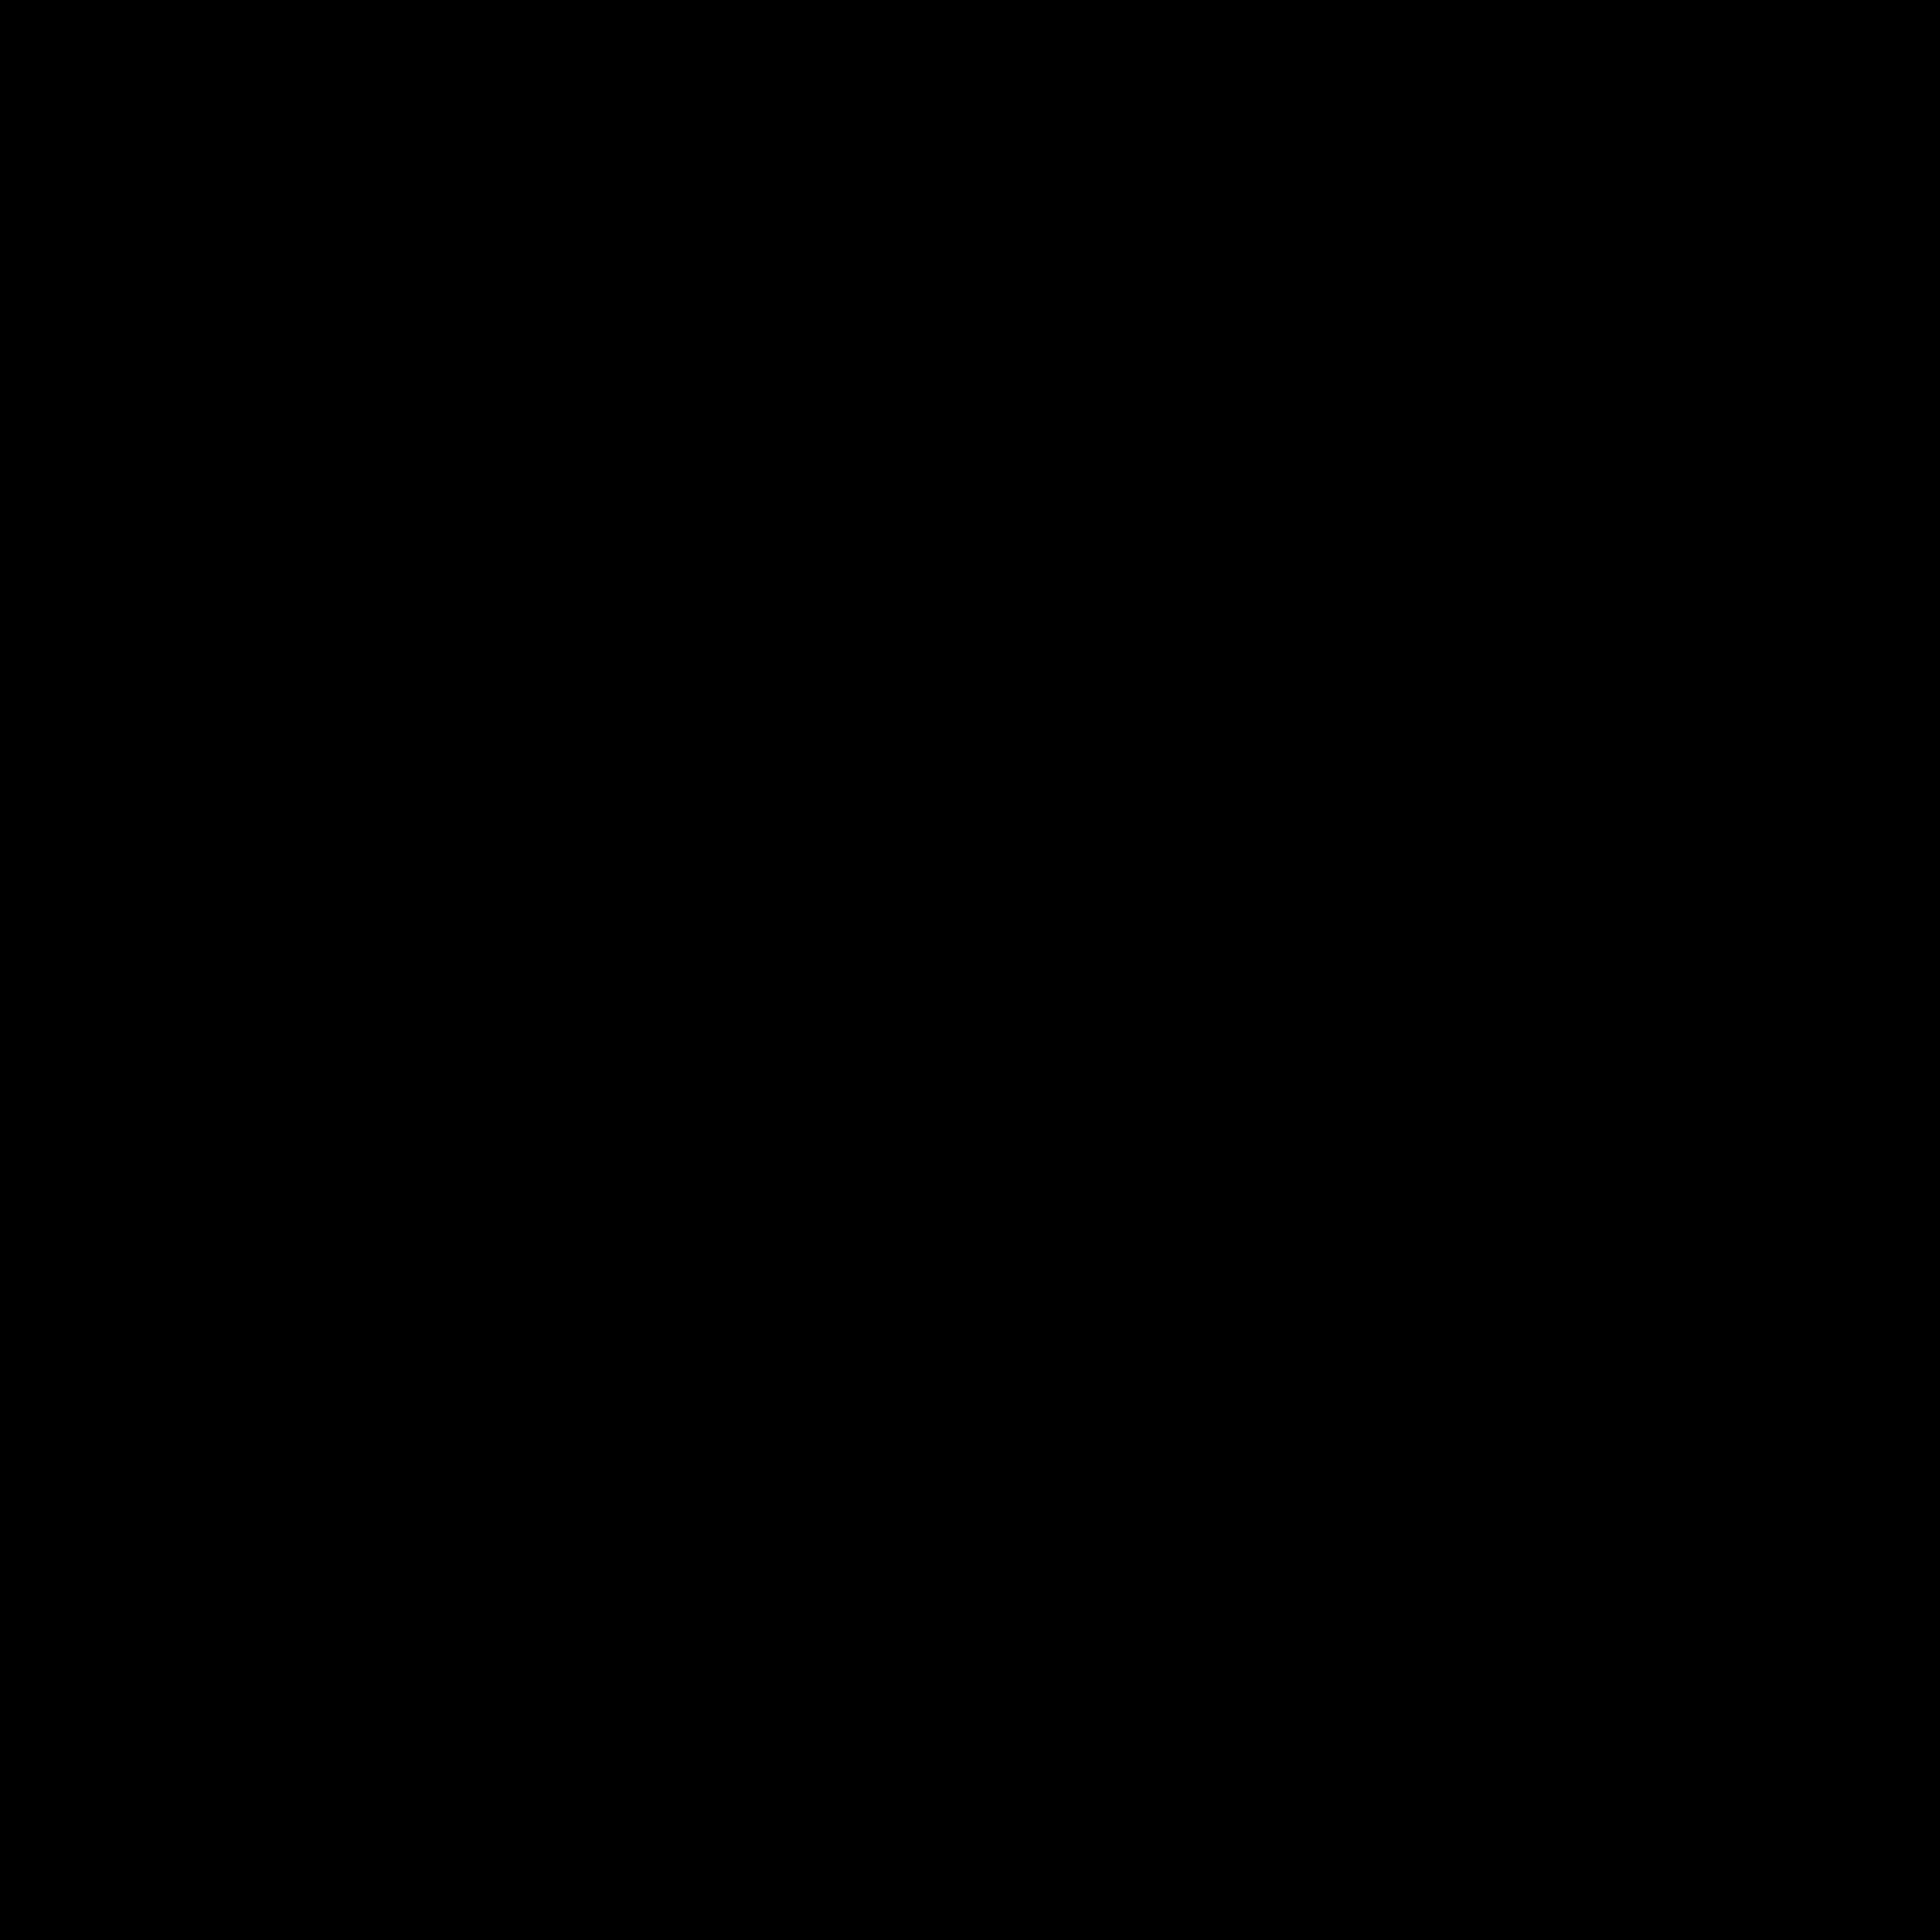 New SVG Image - Peace Symbol PNG